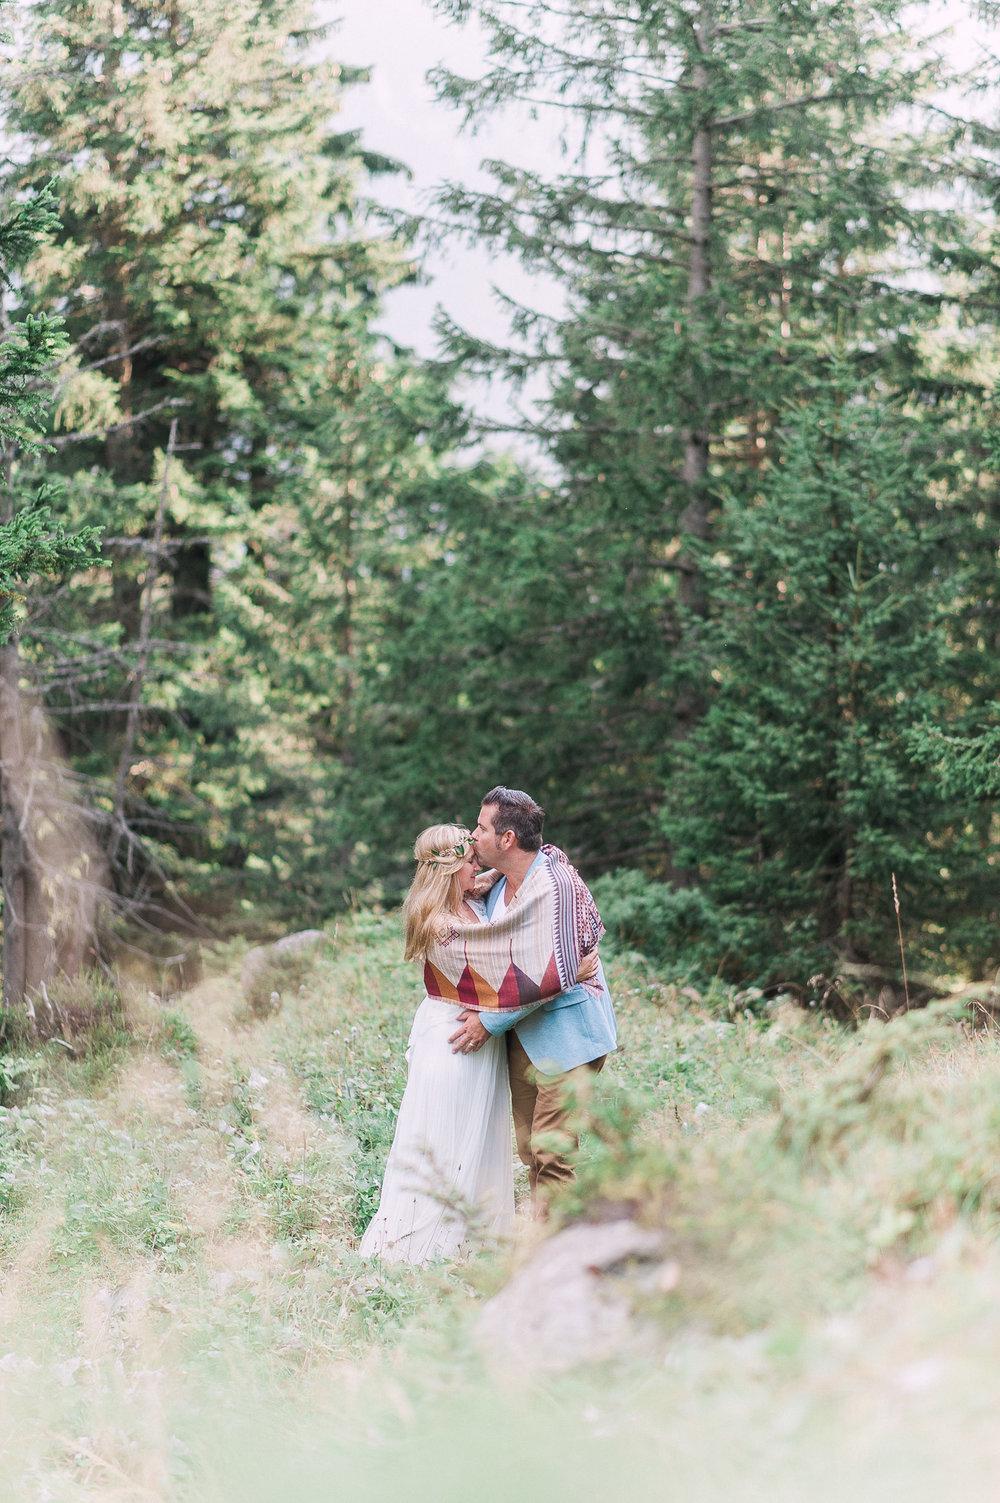 k&m-weddingphotography-23.jpg